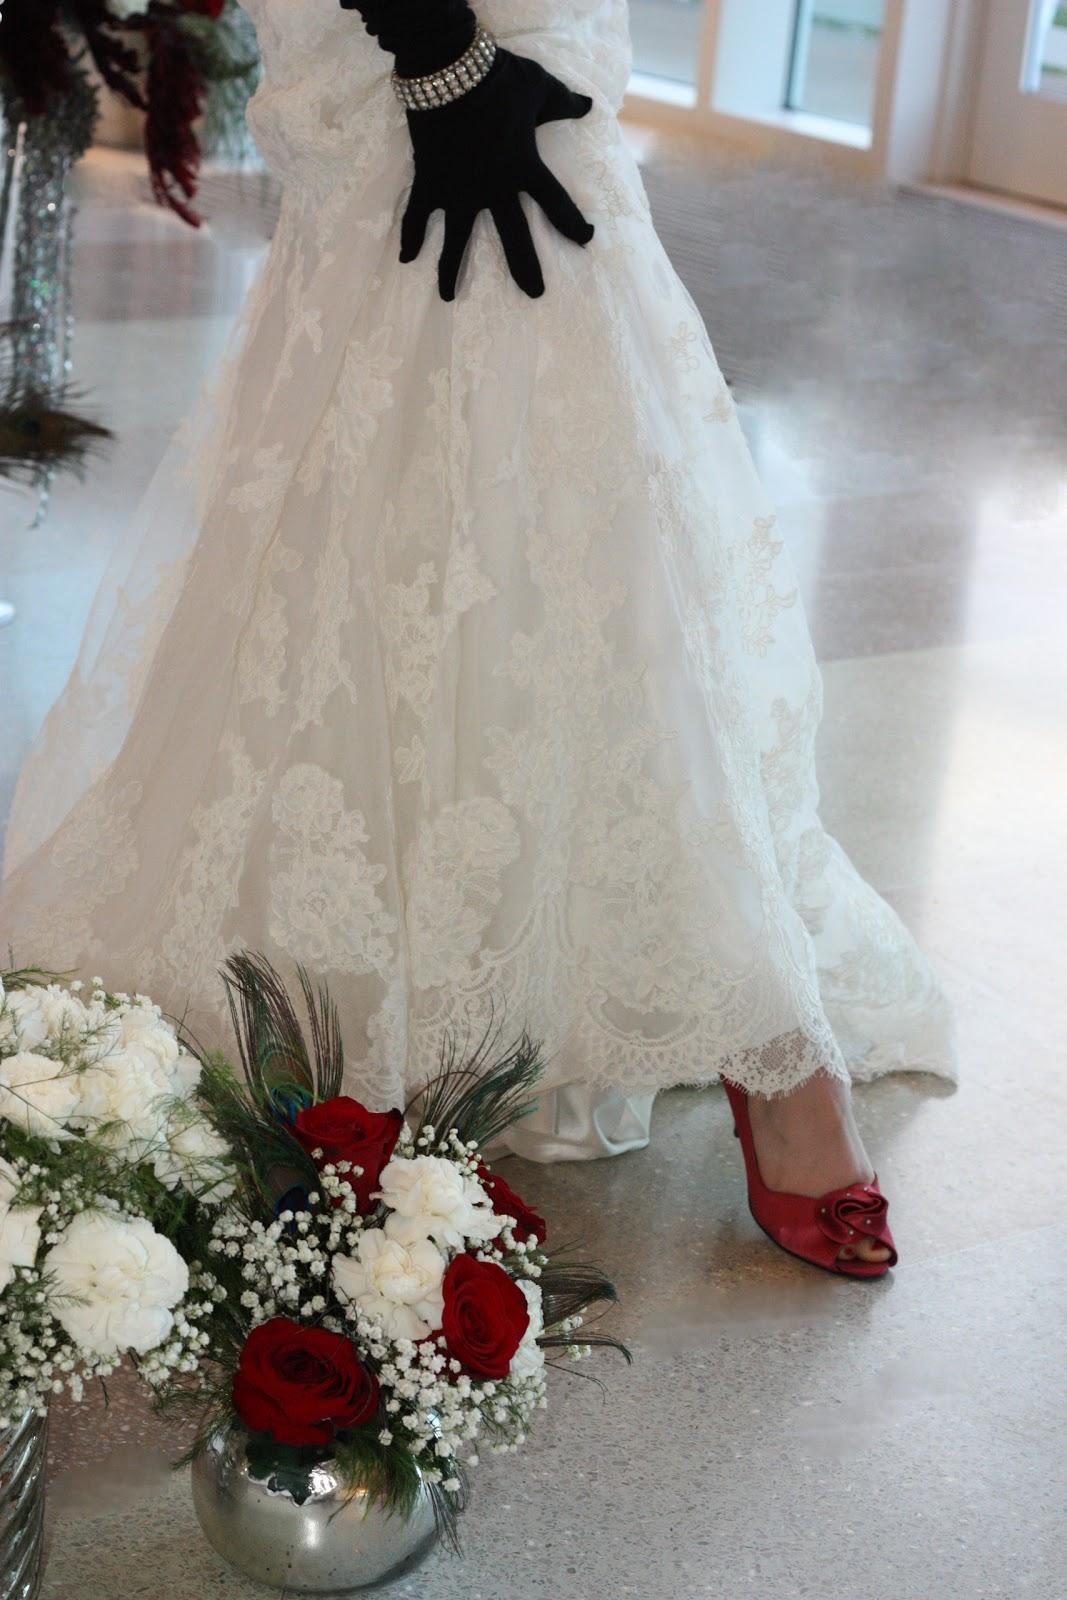 Racquel S Blog Beach Wedding Gazebo With